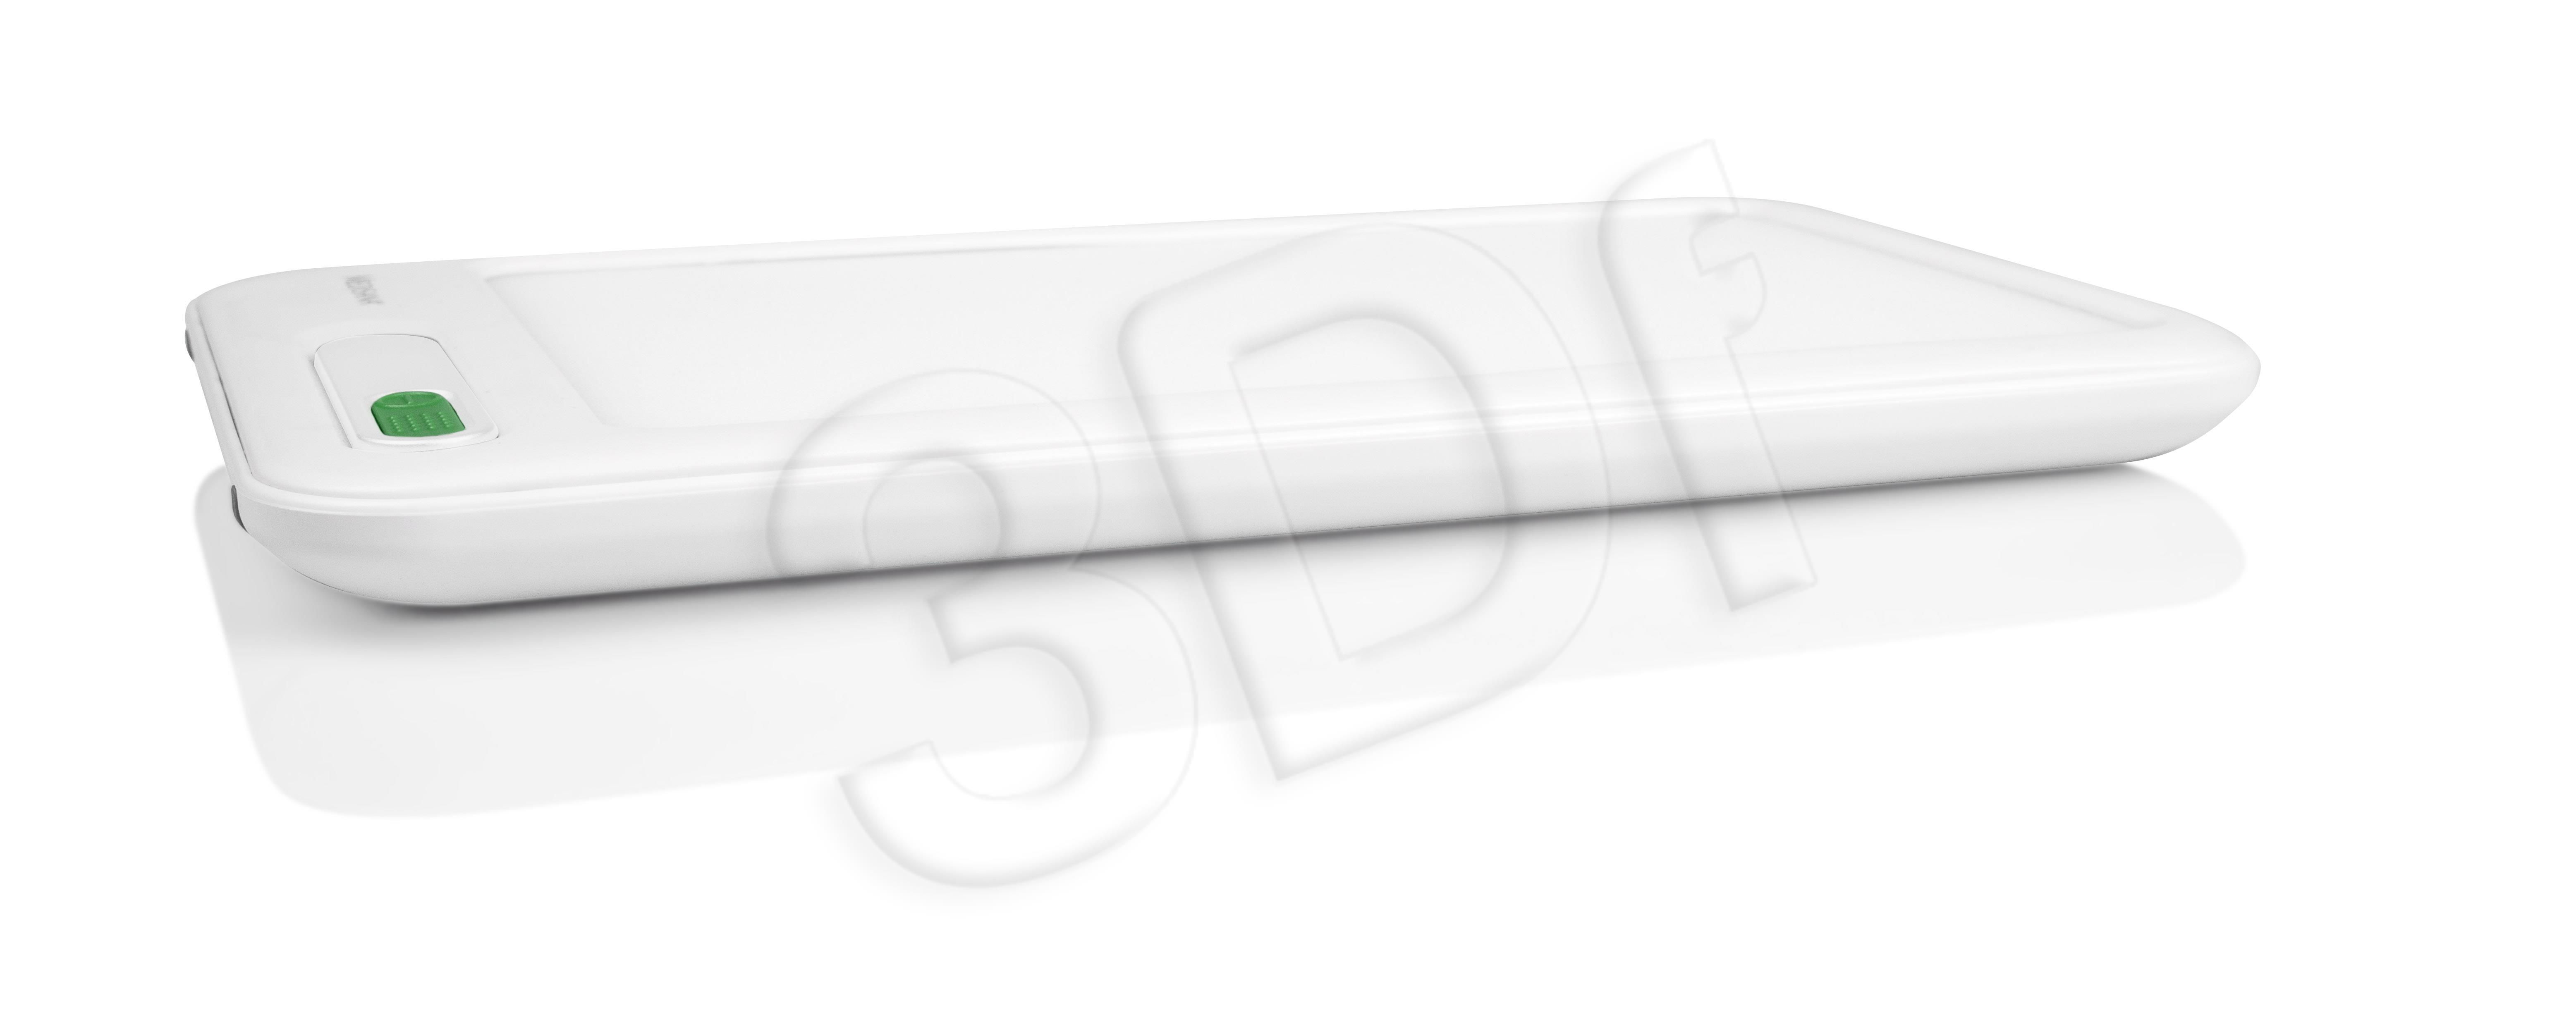 Medisana LT 460 Daylight lamp infrasarkano staru lampa